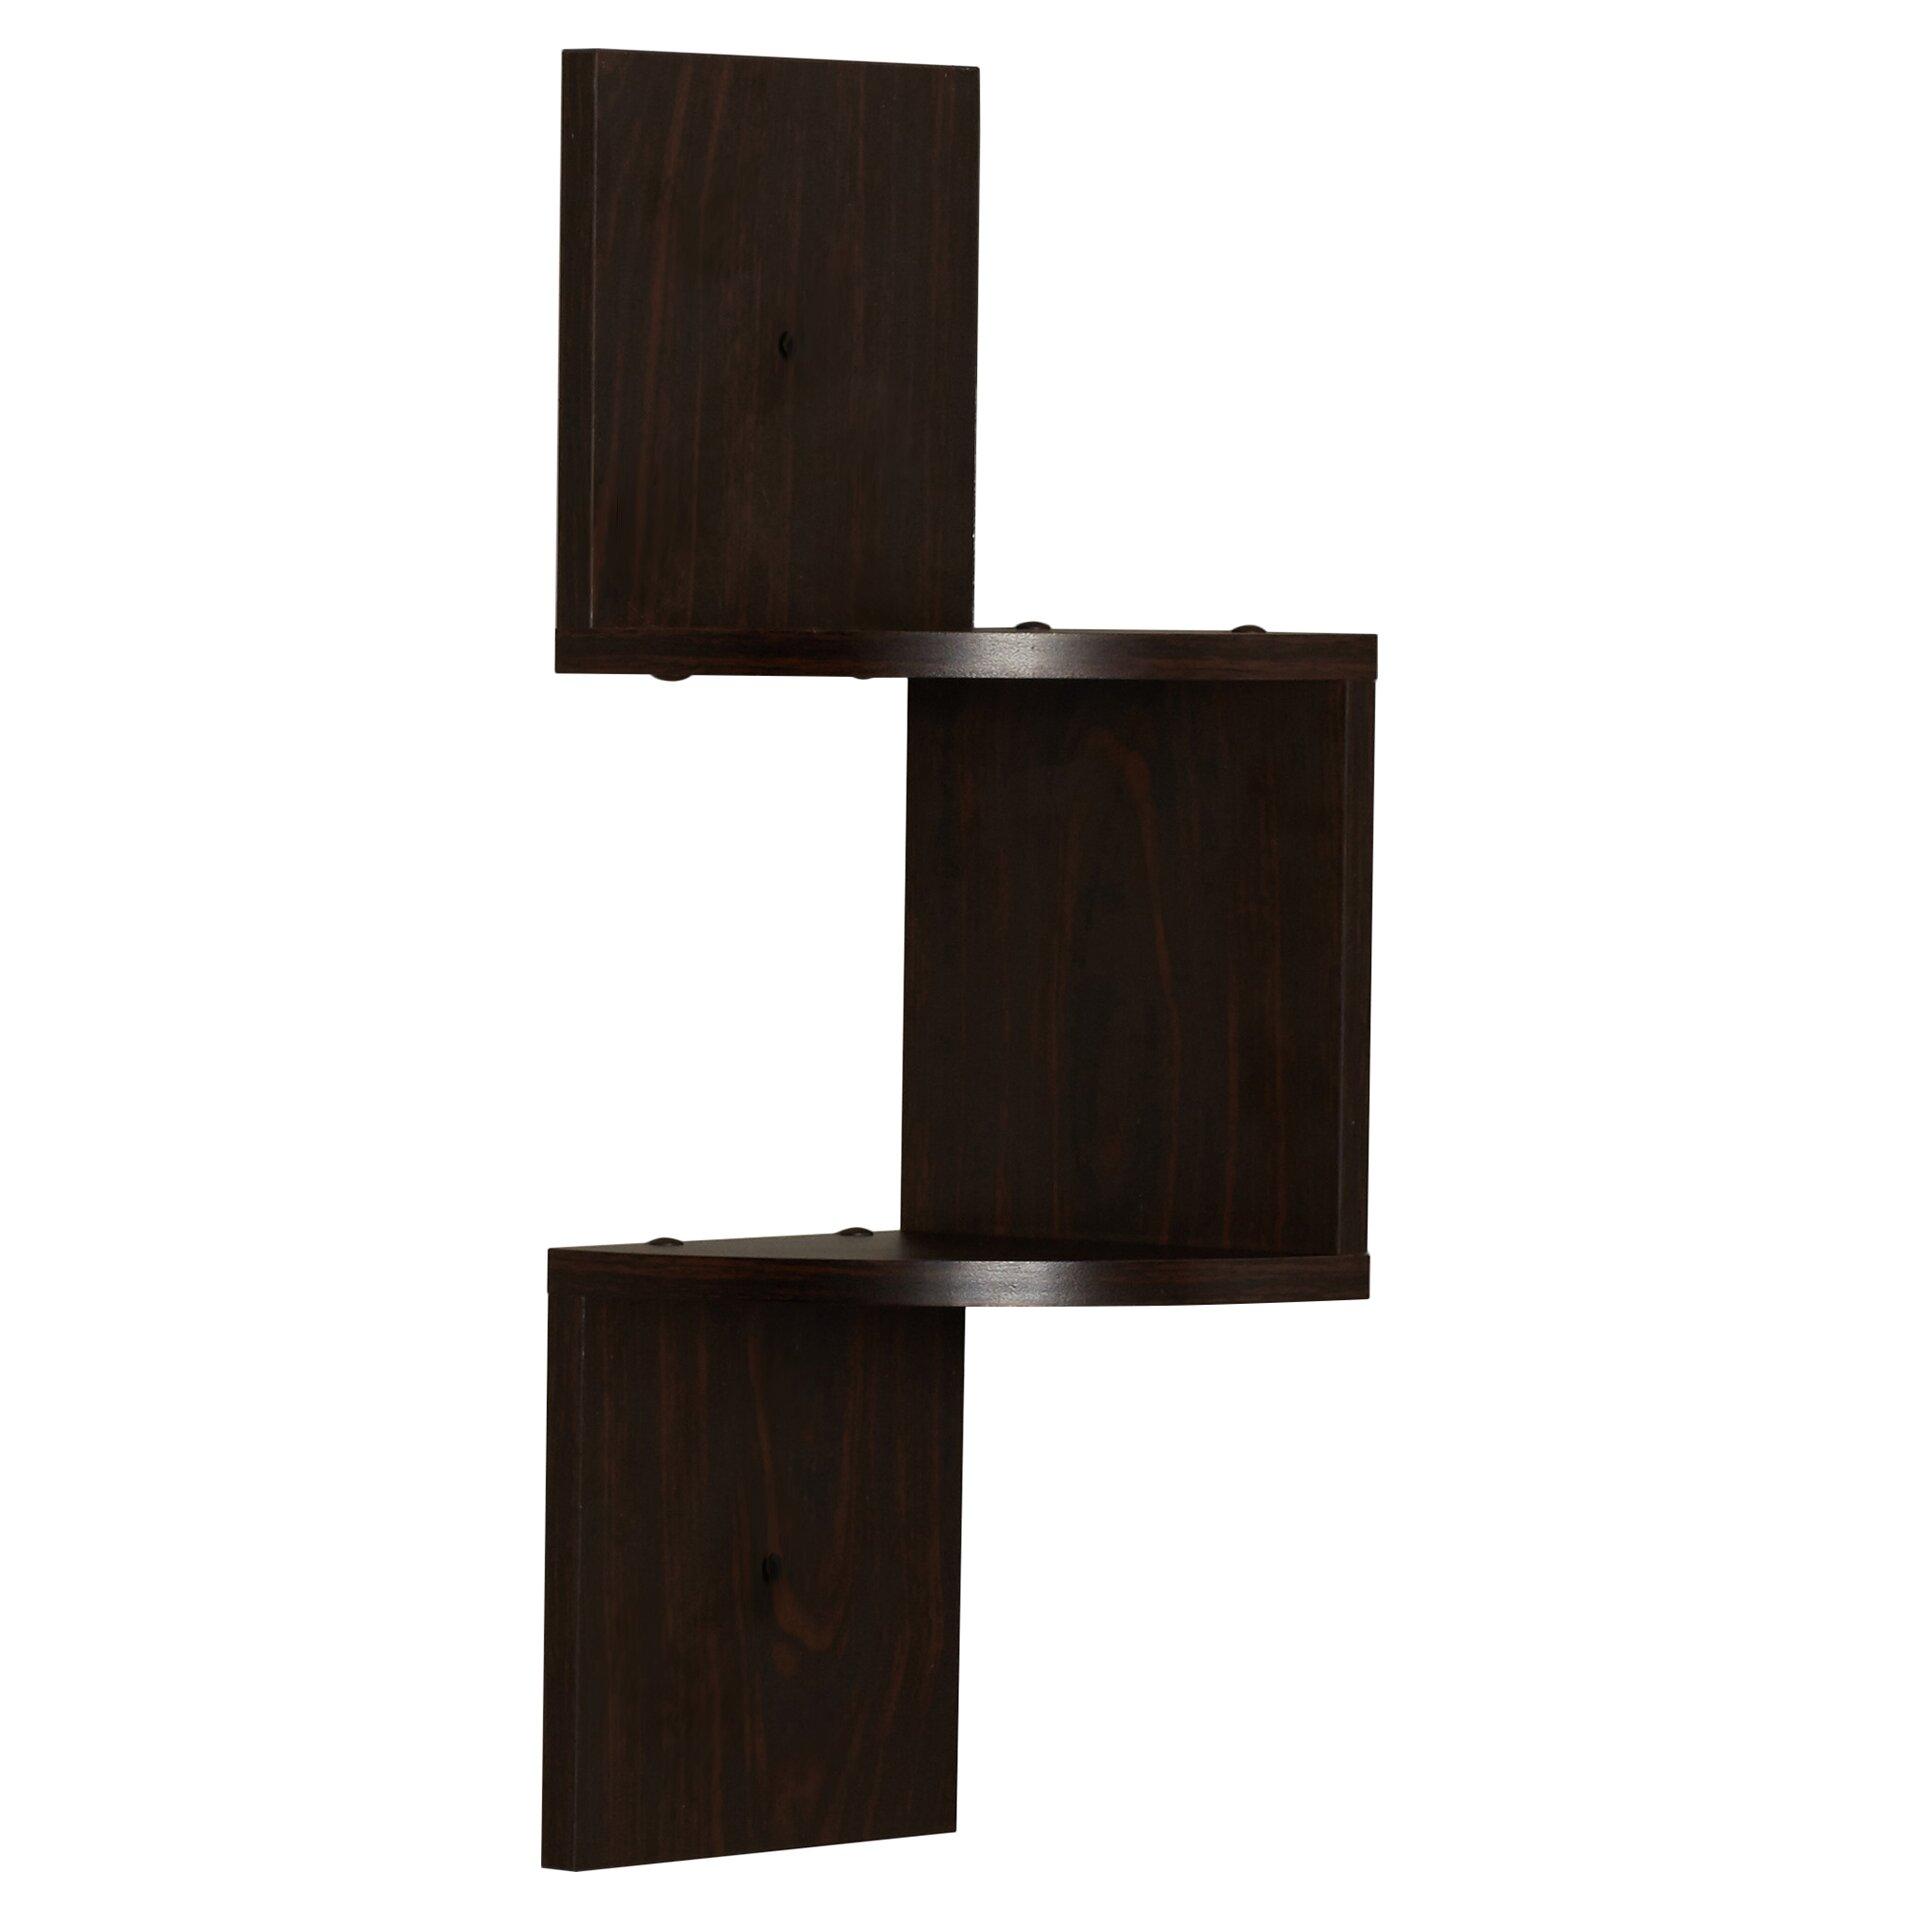 varick gallery ashland corner wall shelf reviews wayfair. Black Bedroom Furniture Sets. Home Design Ideas